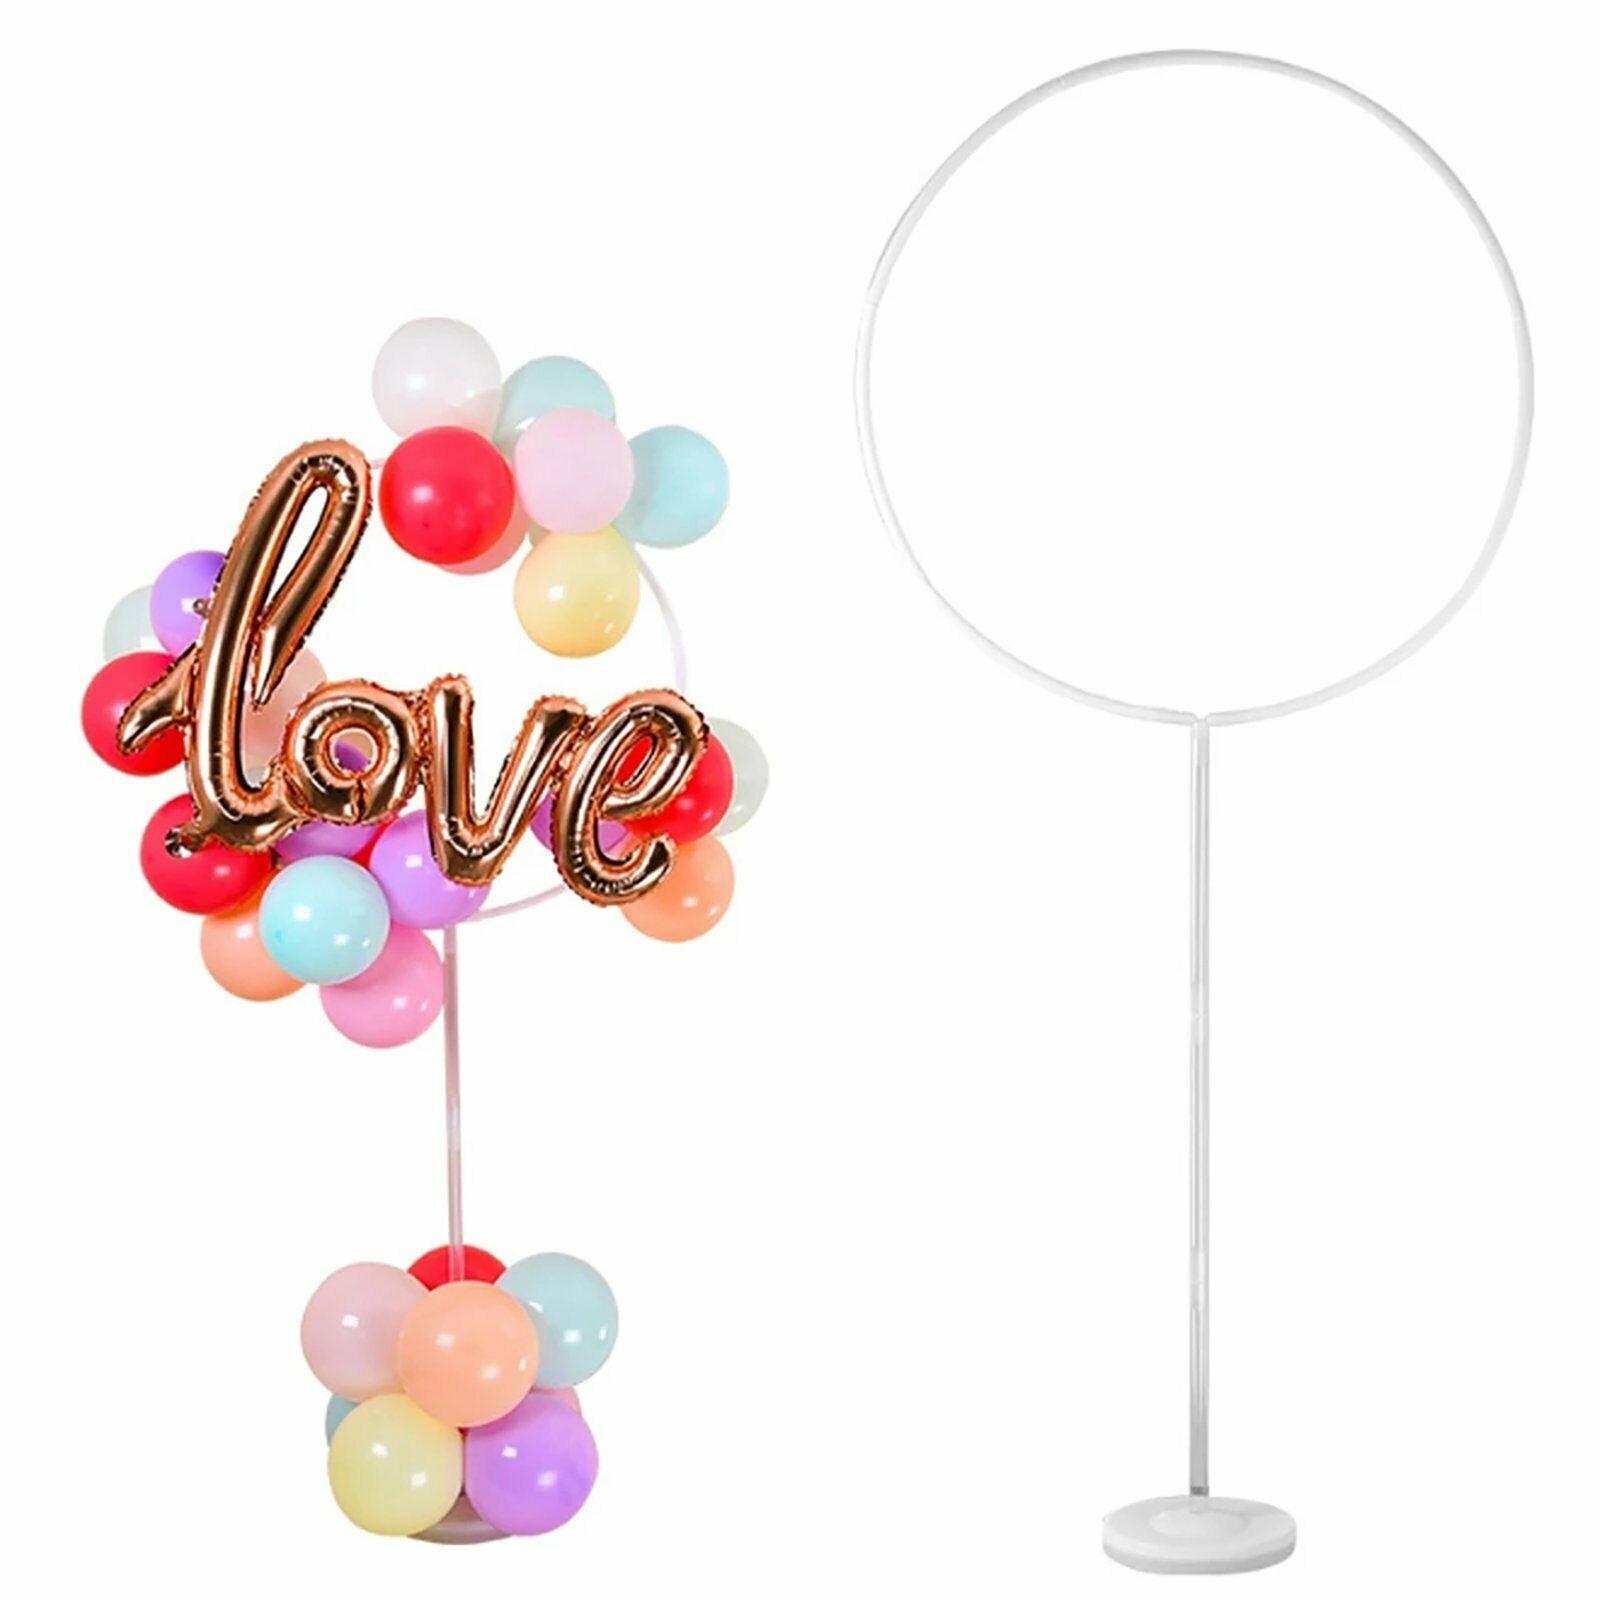 163x73cm Circle Balloon Arch Frame Balloons Stand Holder Kit Wedding Decor